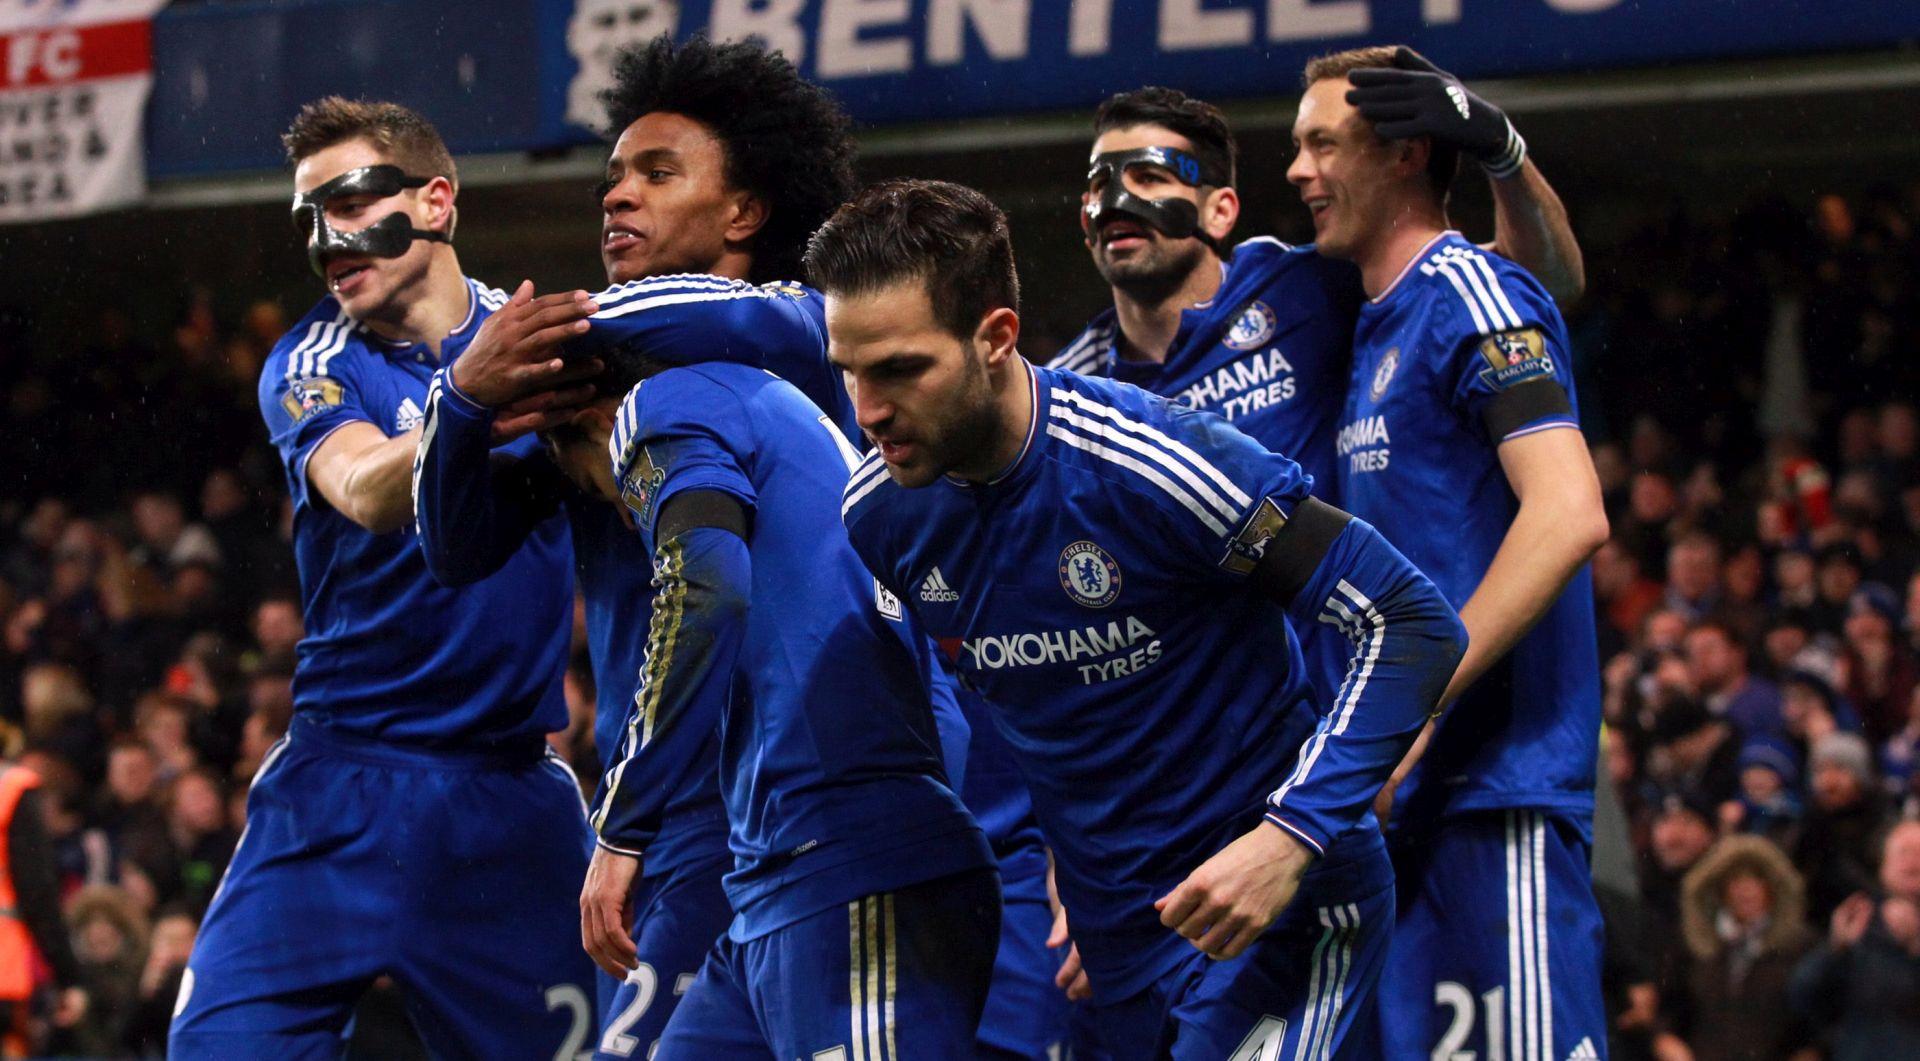 VIDEO: FA KUP Lukaku s dva pogotka izbacio Chelsea